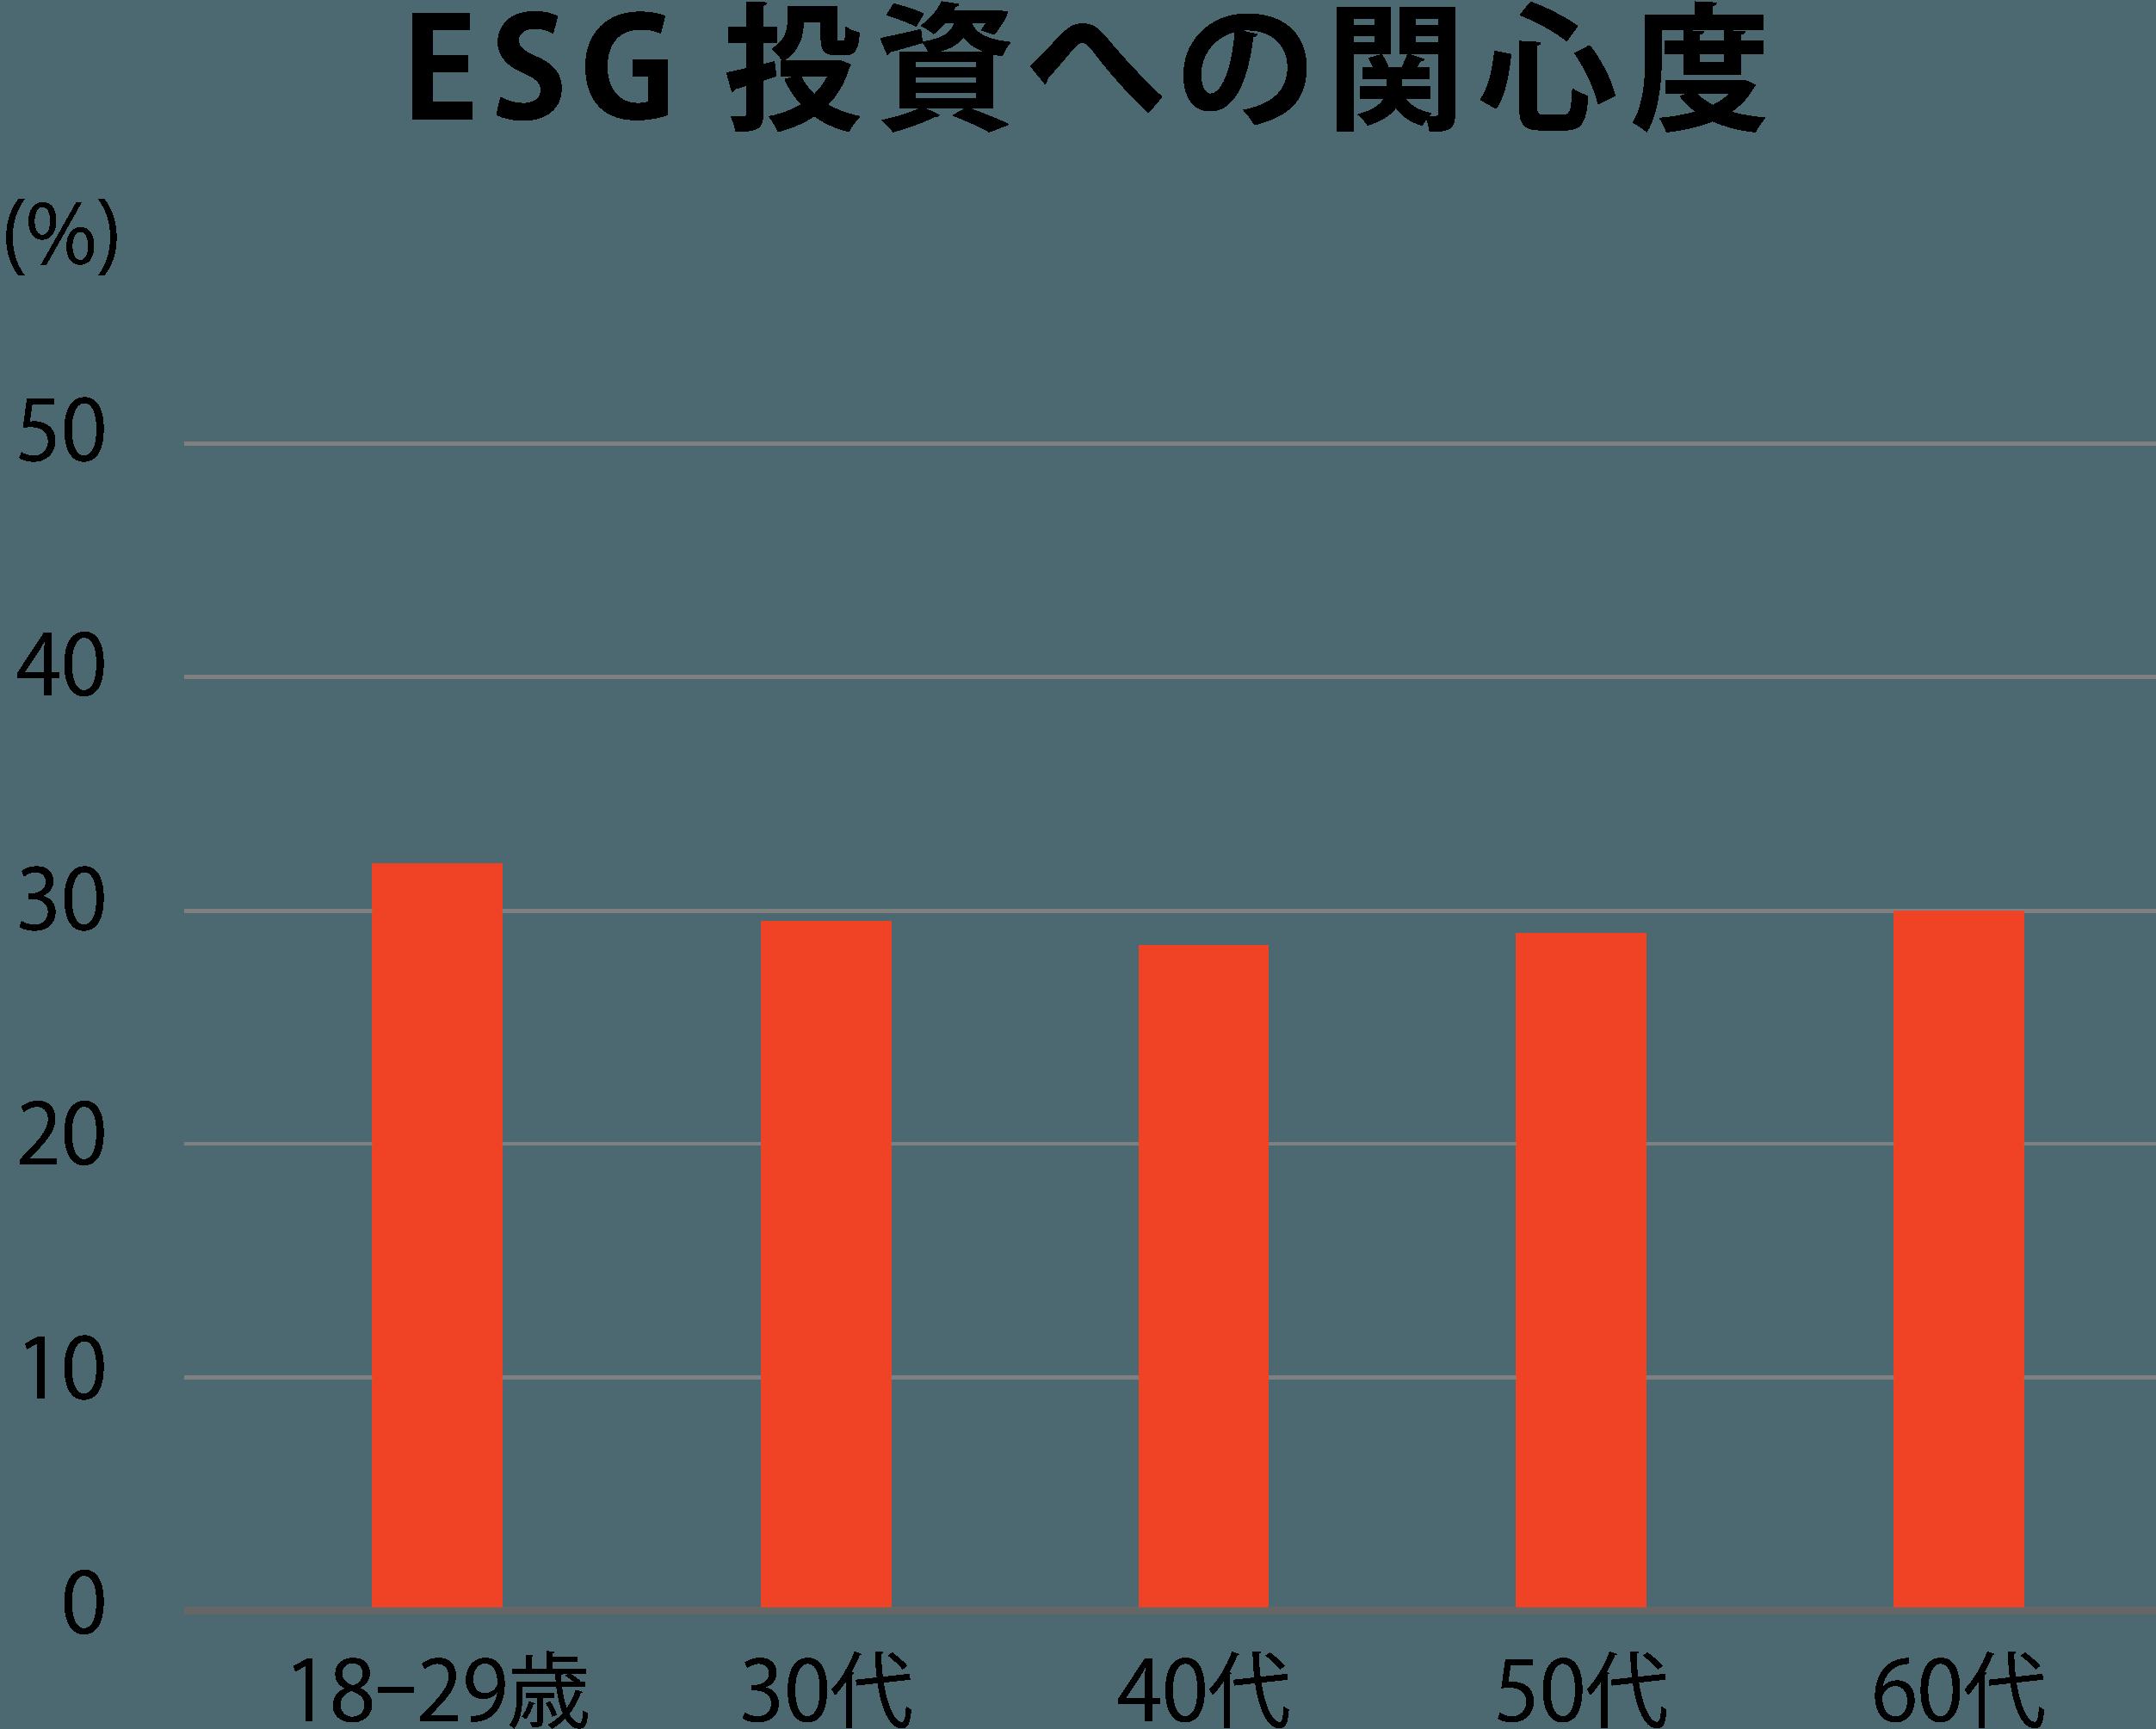 ESG投資への関心度